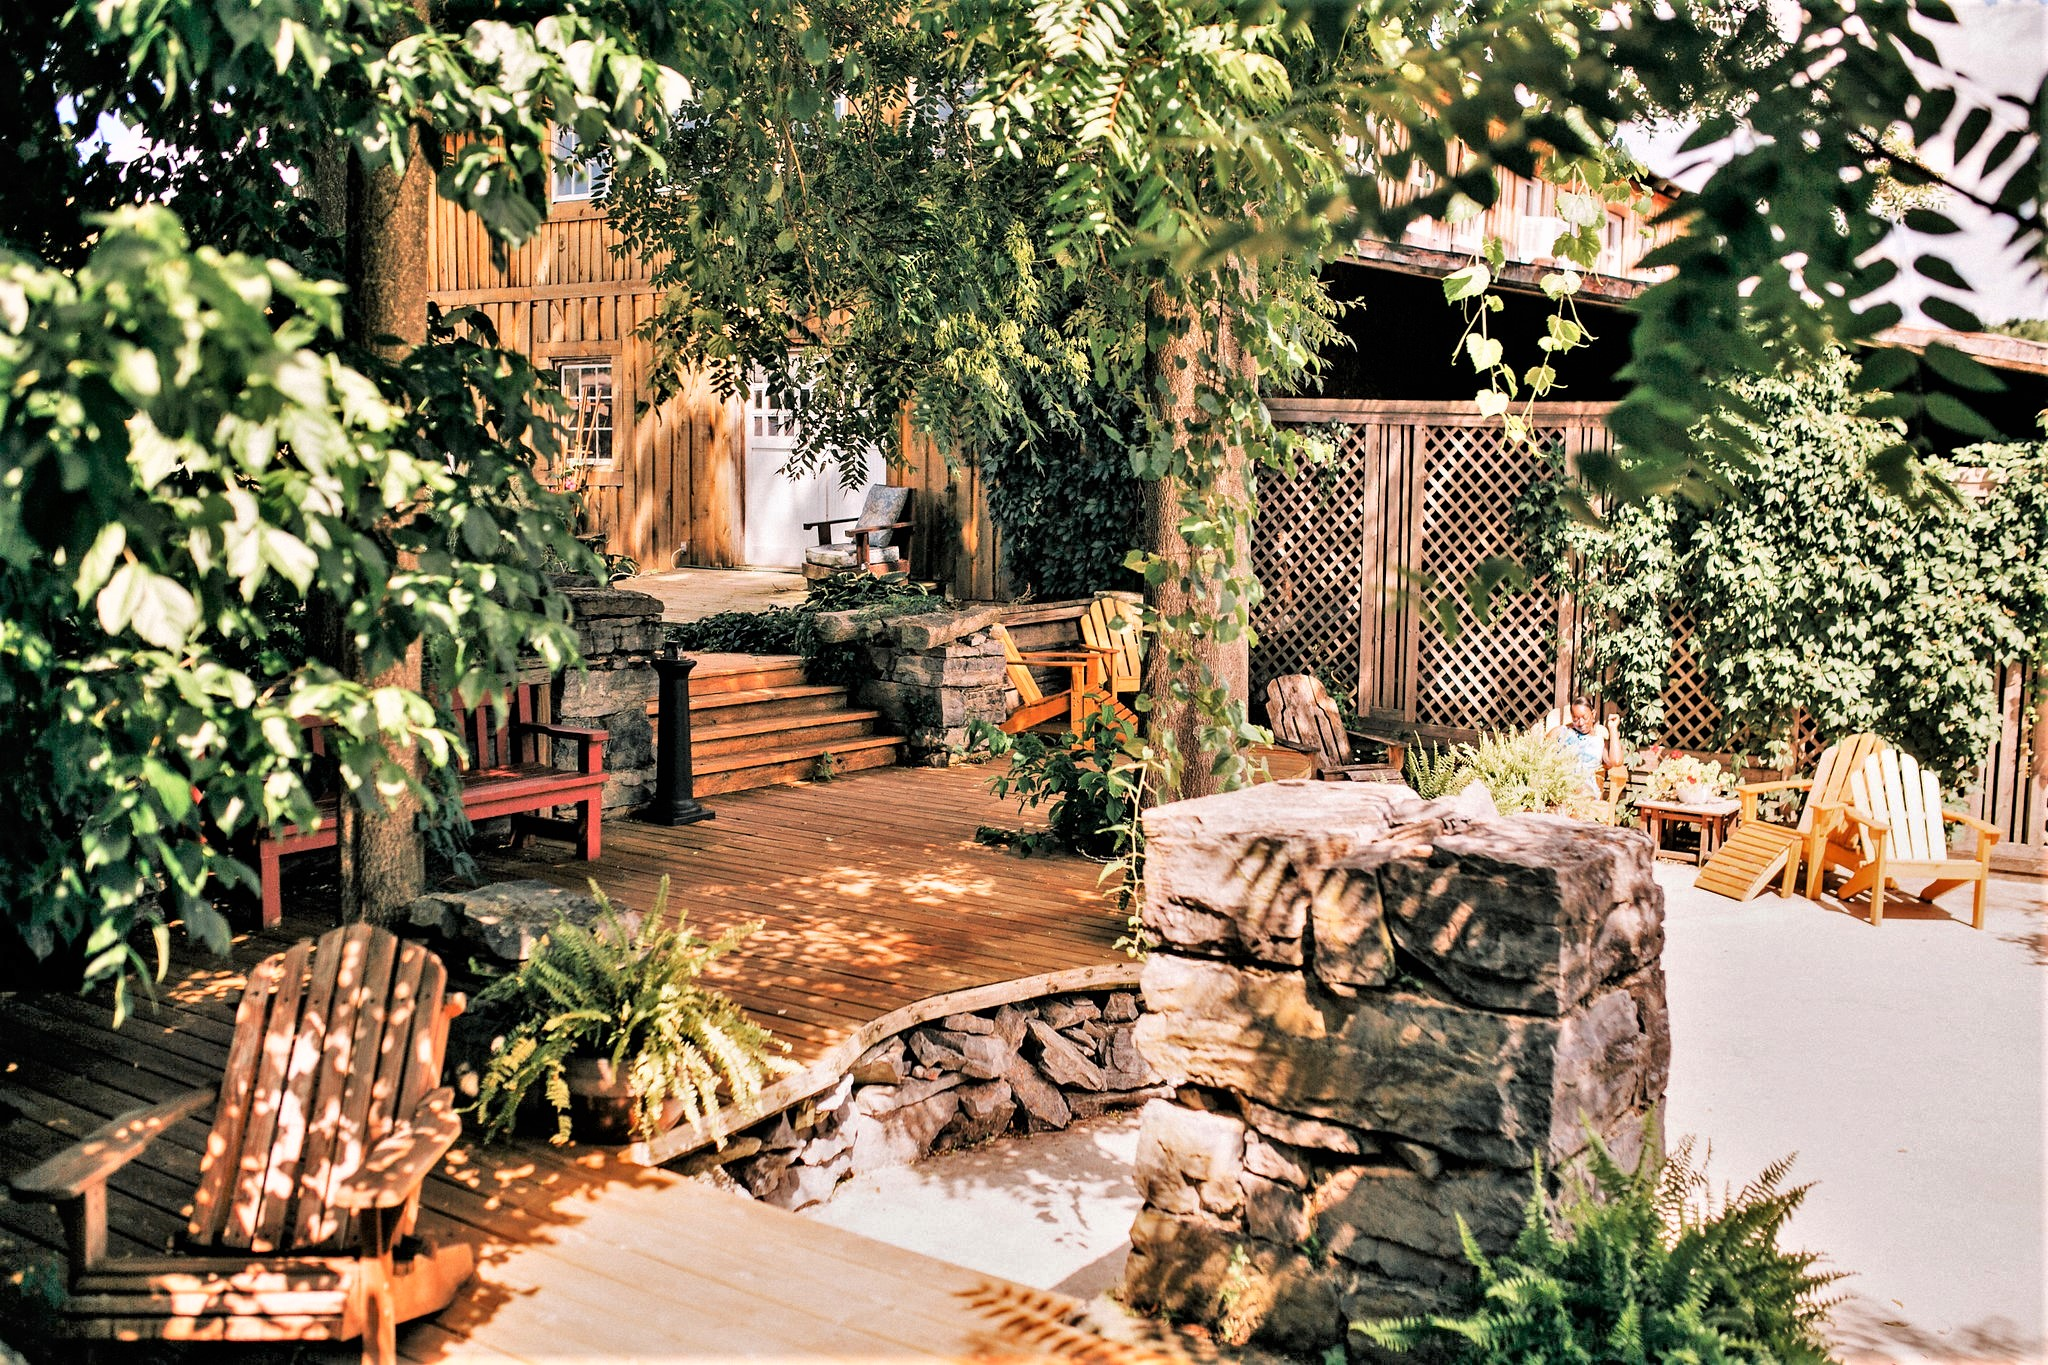 Stone Garden | Virginia Retreat Location Near Lexington | Antonia Albano.JPG